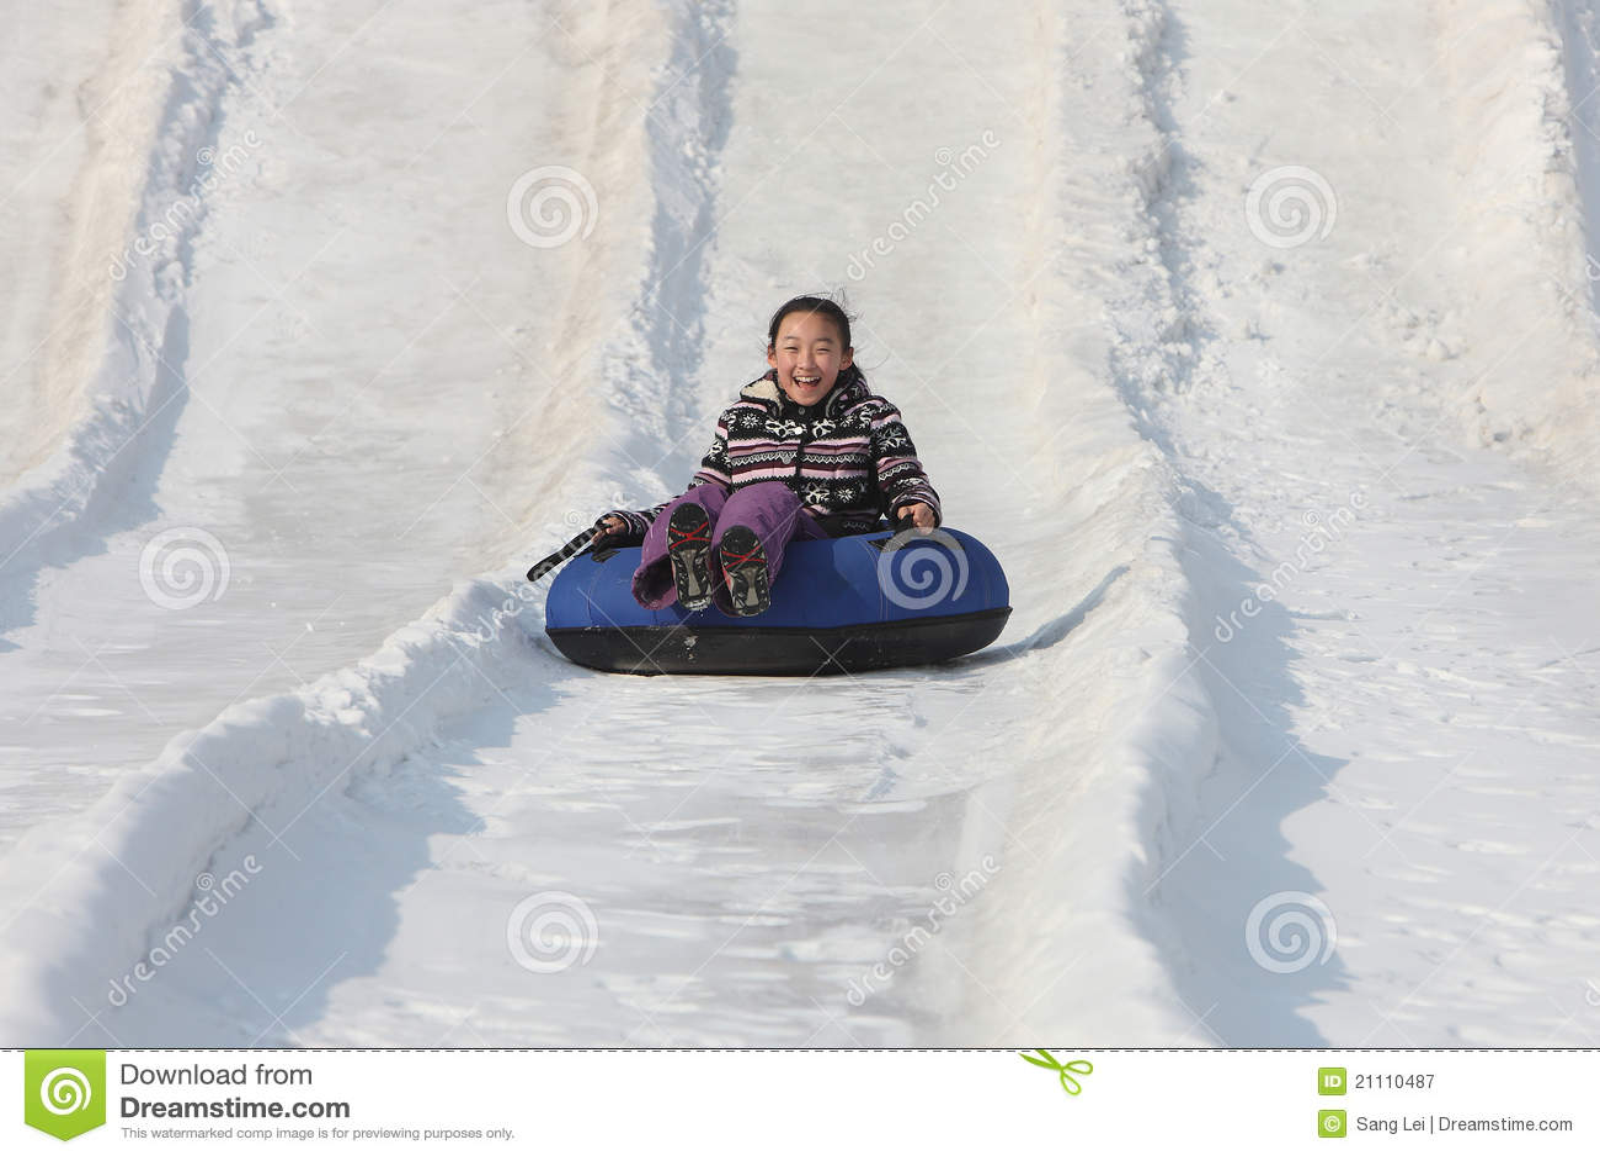 ski spiel